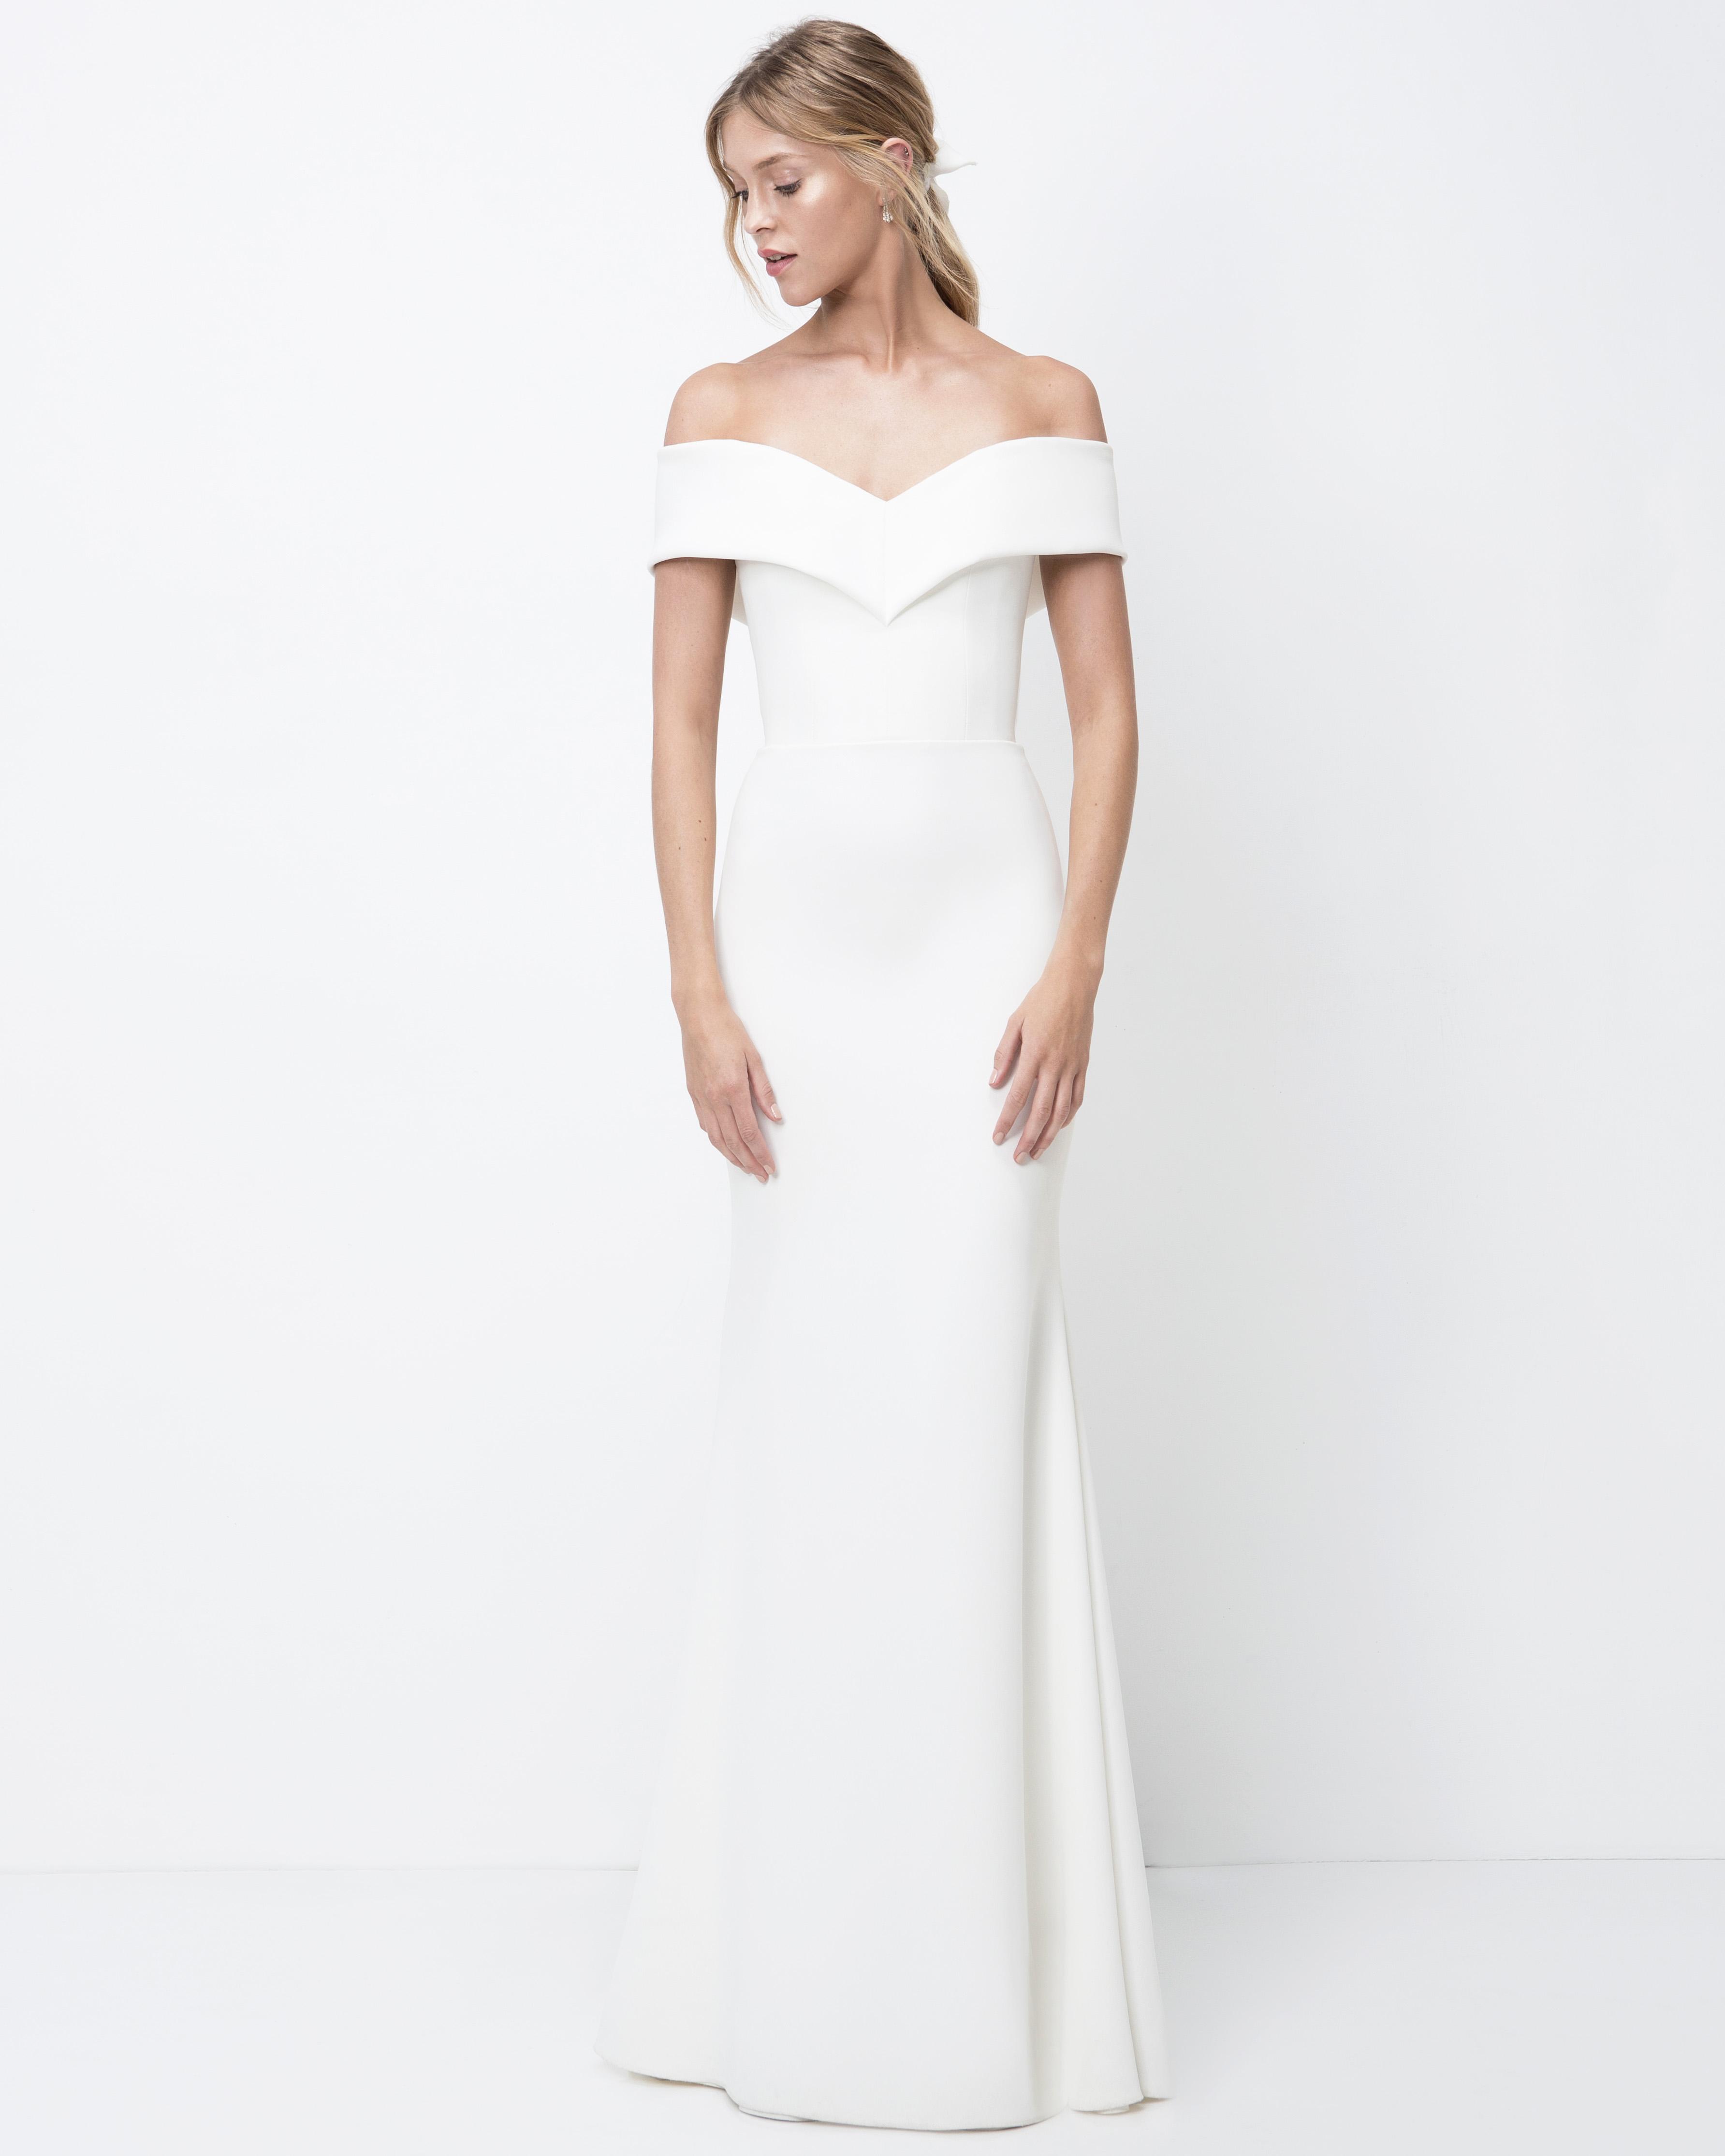 lihi hod off-the-shoulder trumpet wedding dress fall 2018